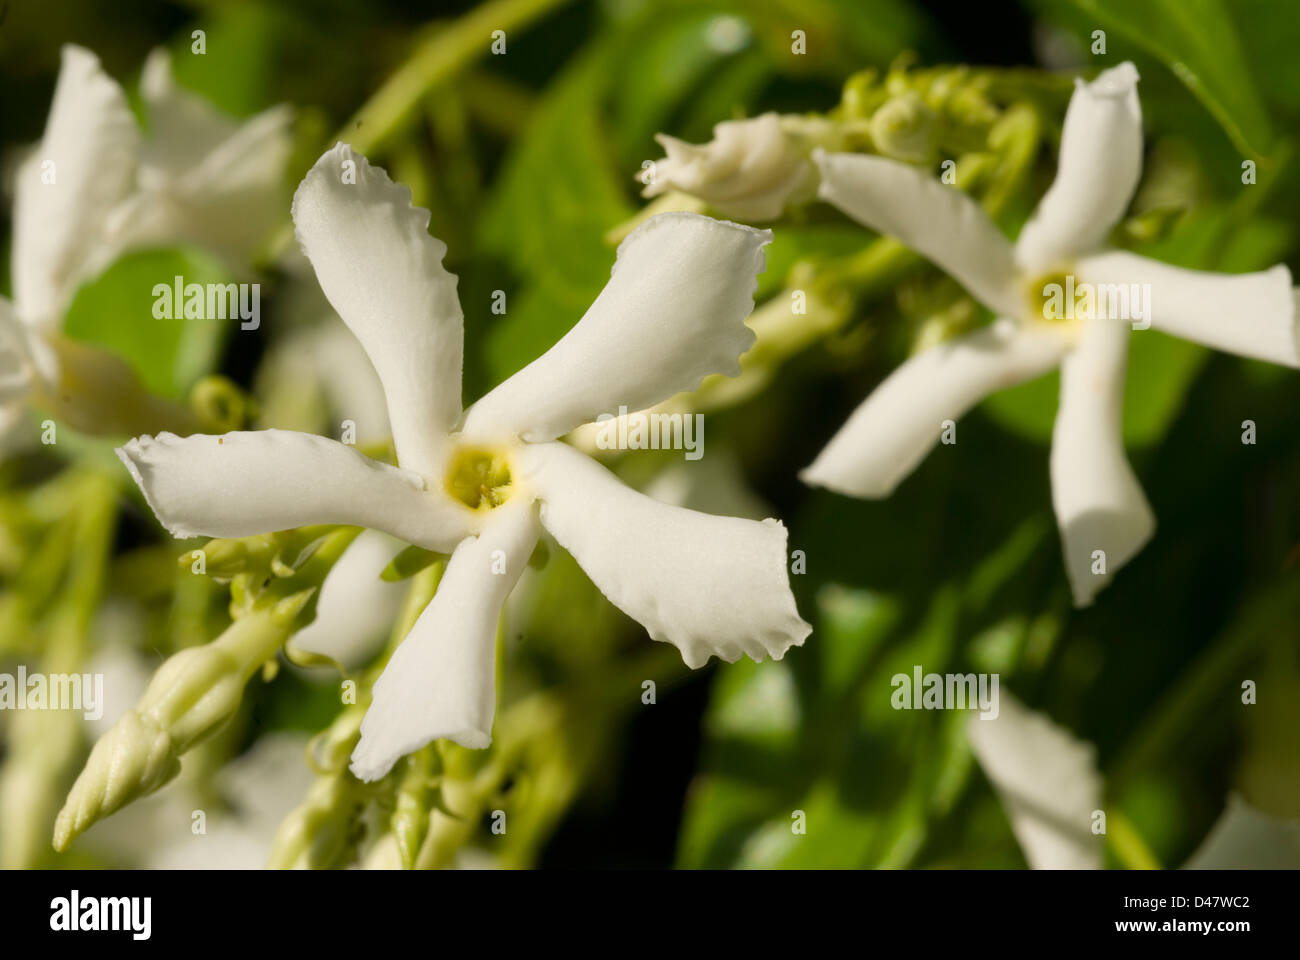 Jasmine Jasminum sp., gelsomino, Oleaceae - Stock Image